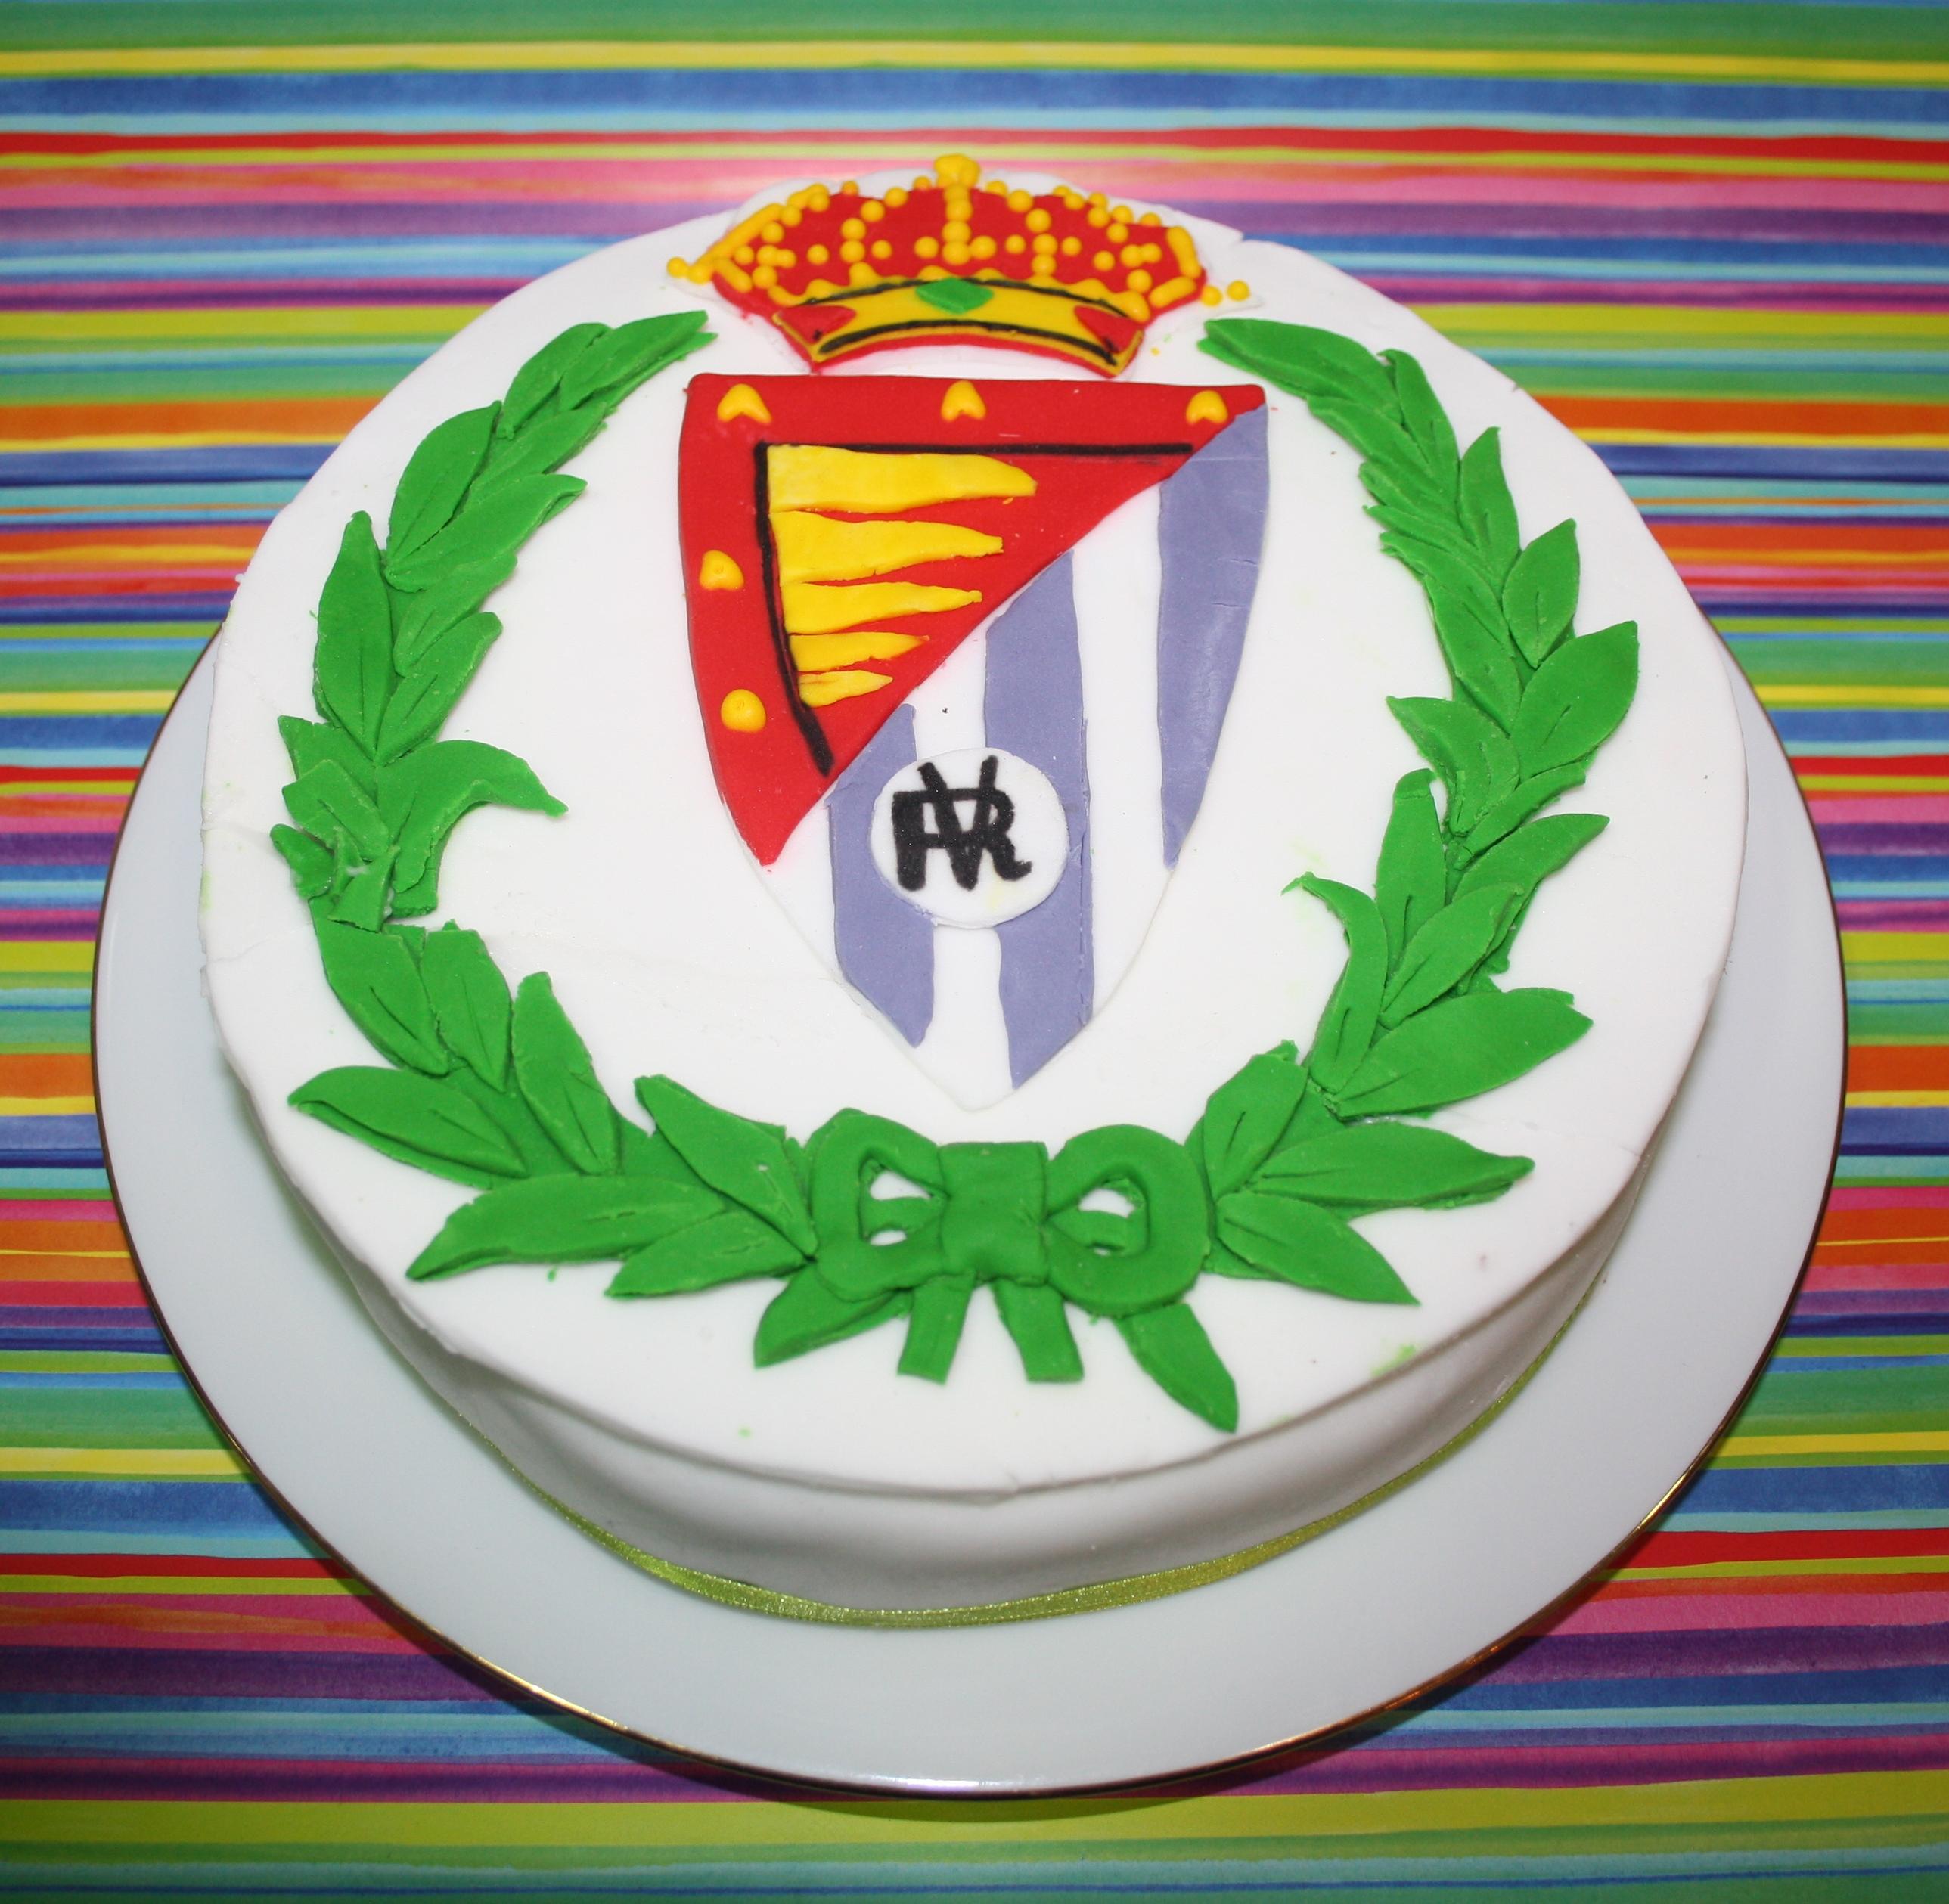 Pastel de cumpleaos de Madeira Sponge Cake MSC con escudo del R